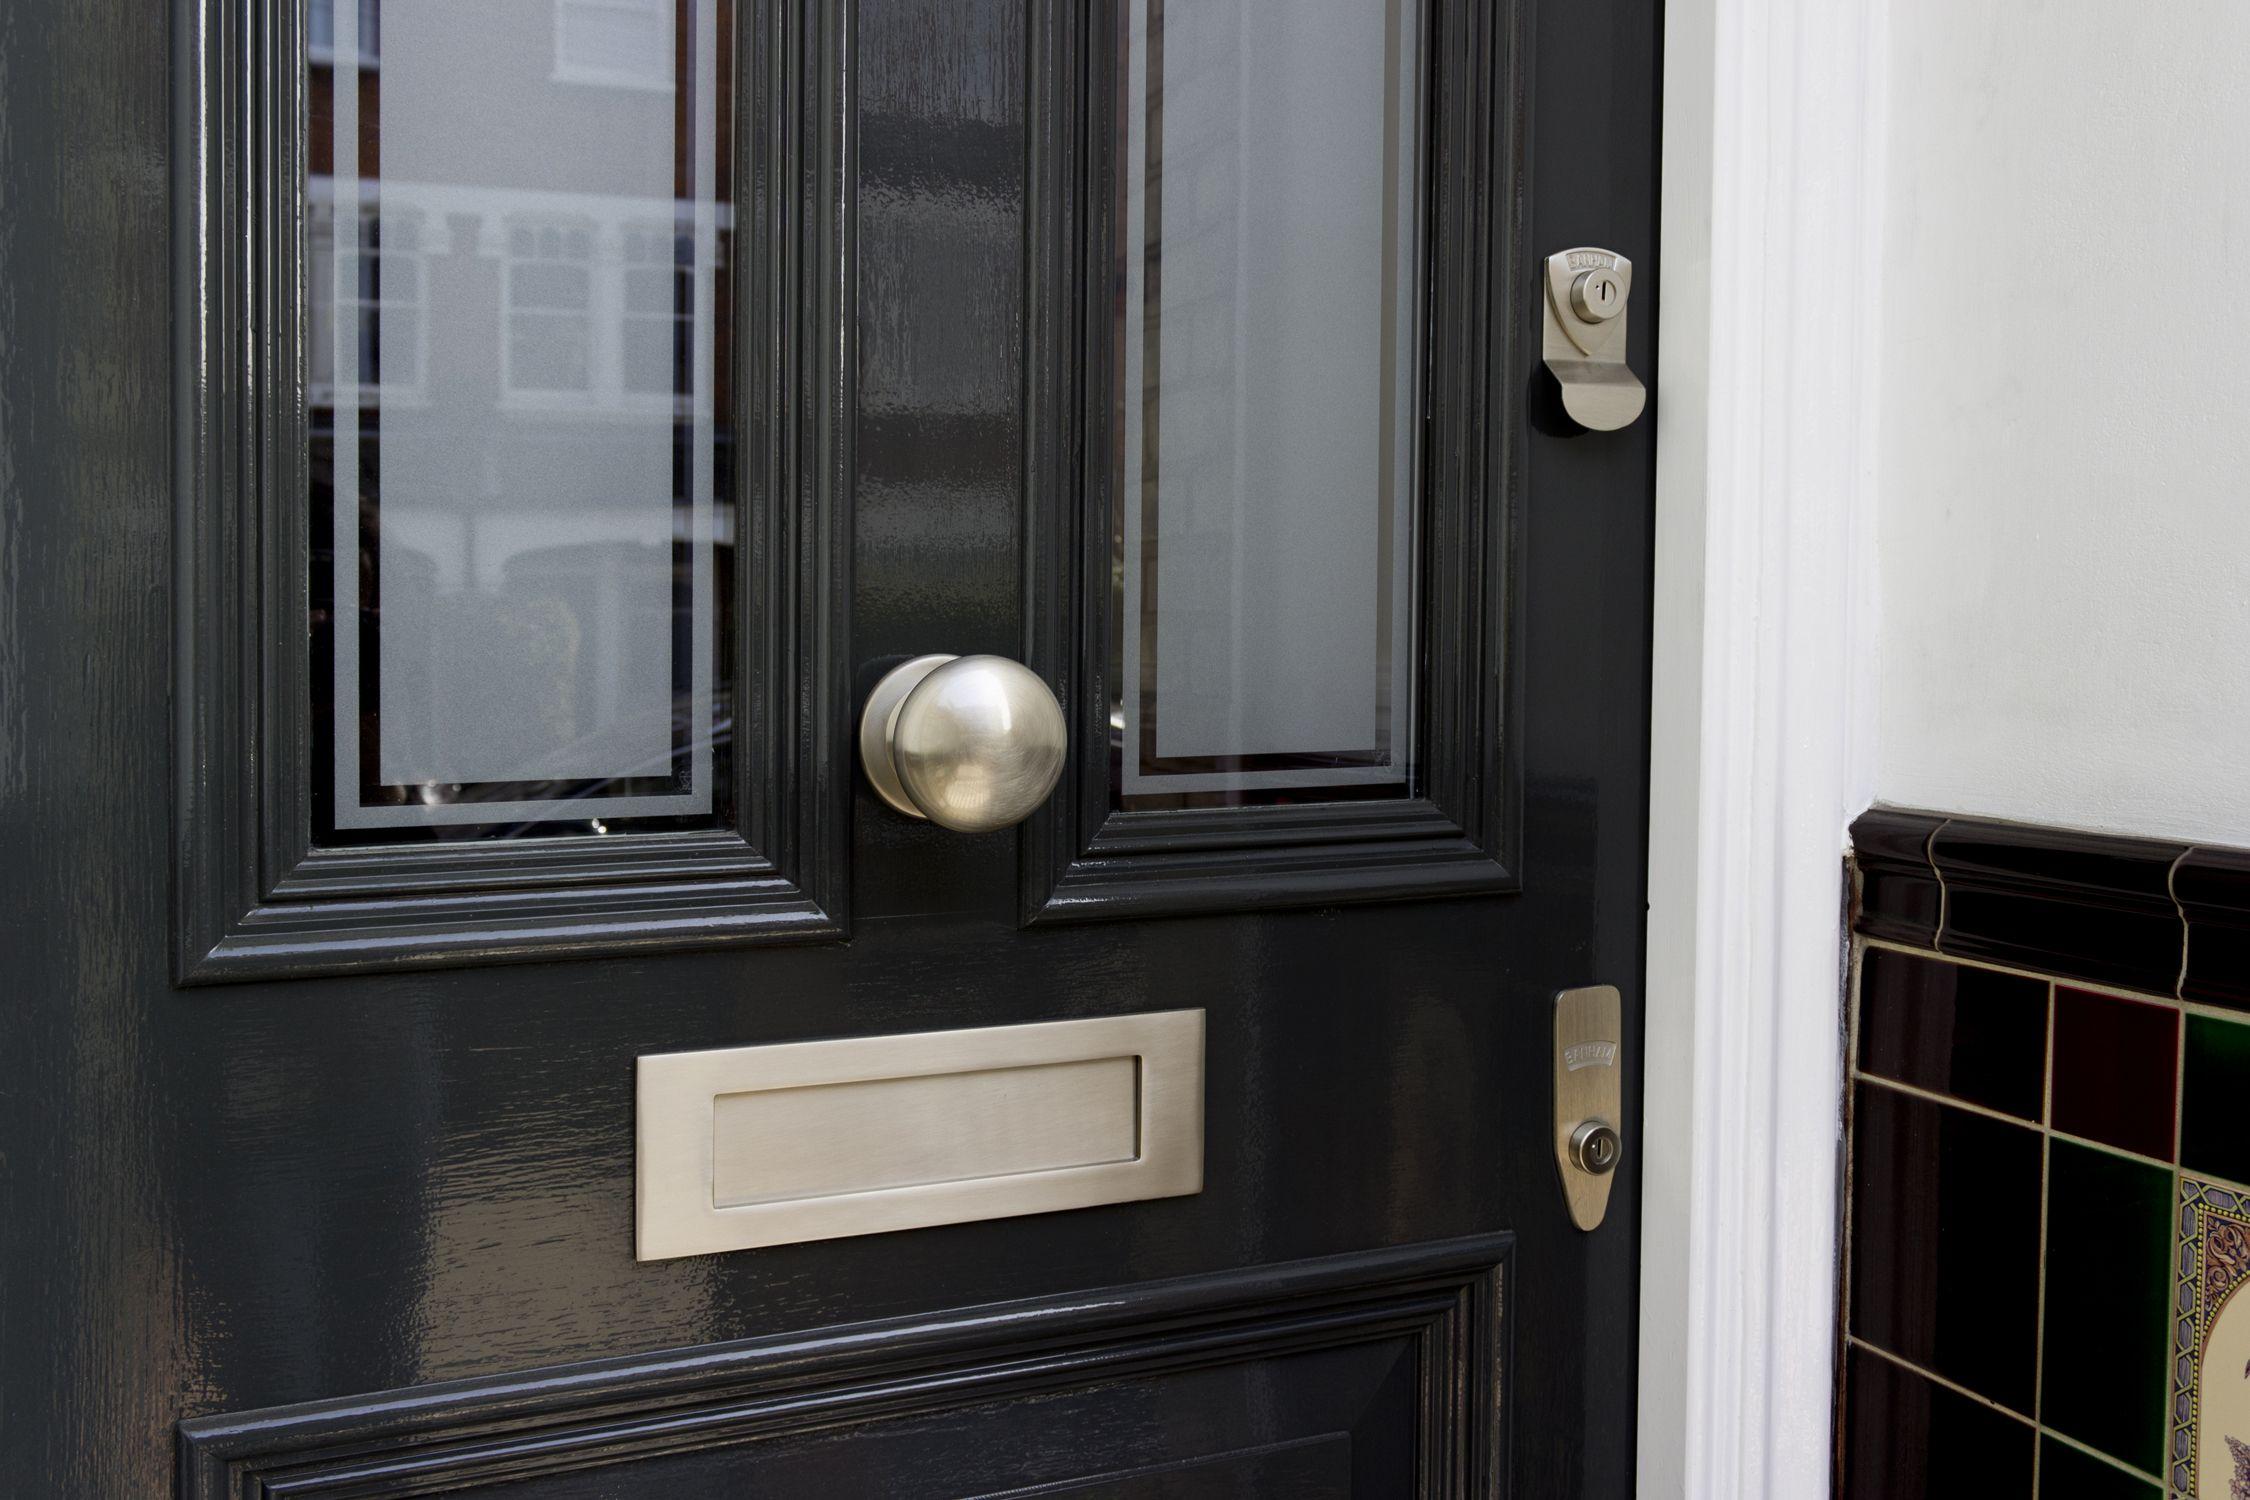 Bespoke #Banham #London #security www.banham.co.uk | Locks ...